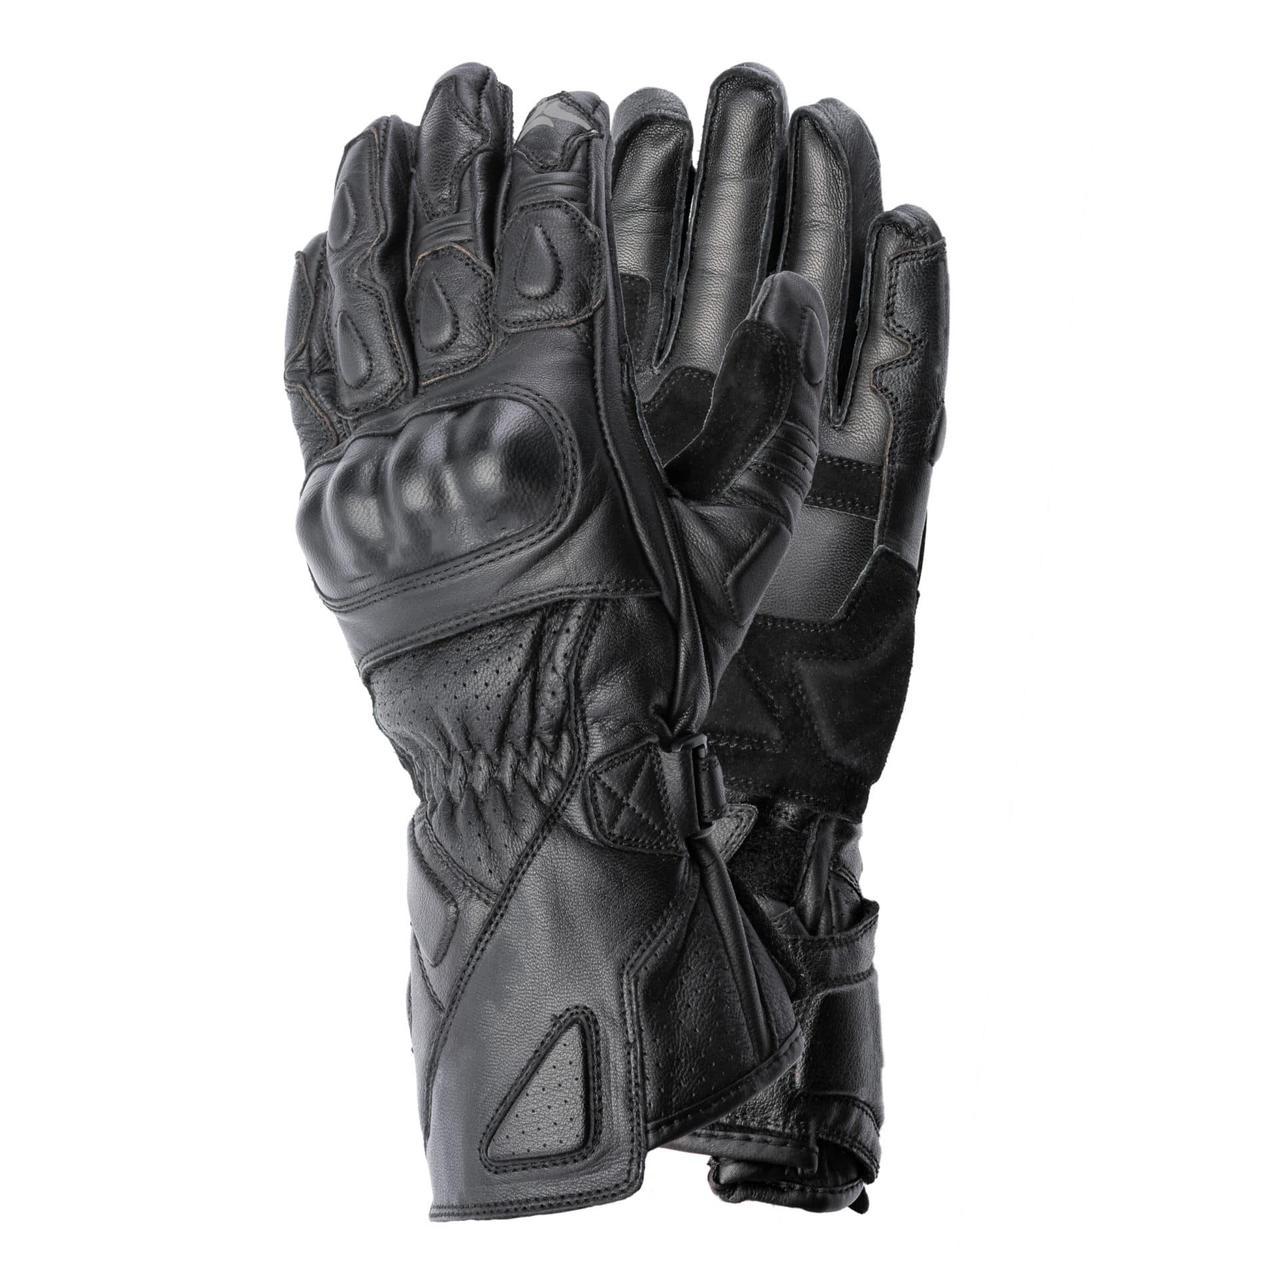 Мотоперчатки SECA INTEGRA III black